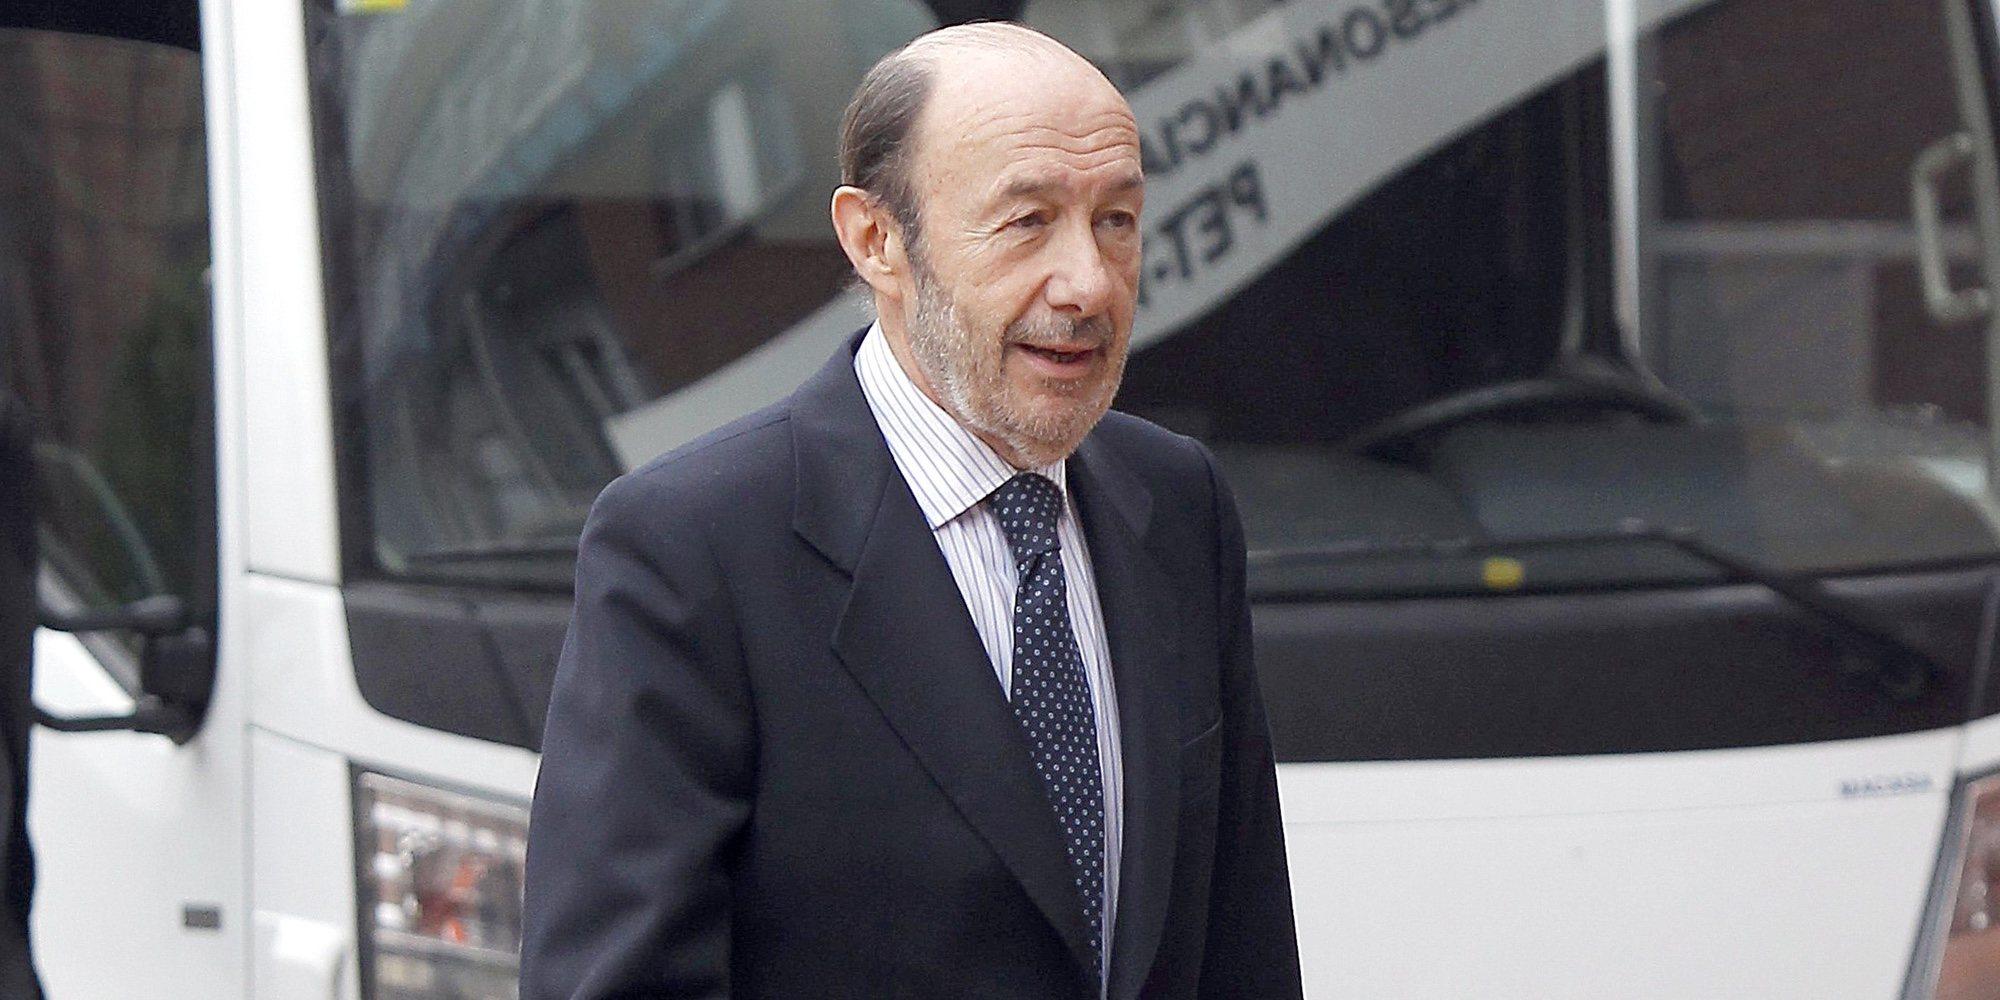 Alfredo Pérez Rubalcaba, hospitalizado en estado grave tras sufrir un ictus